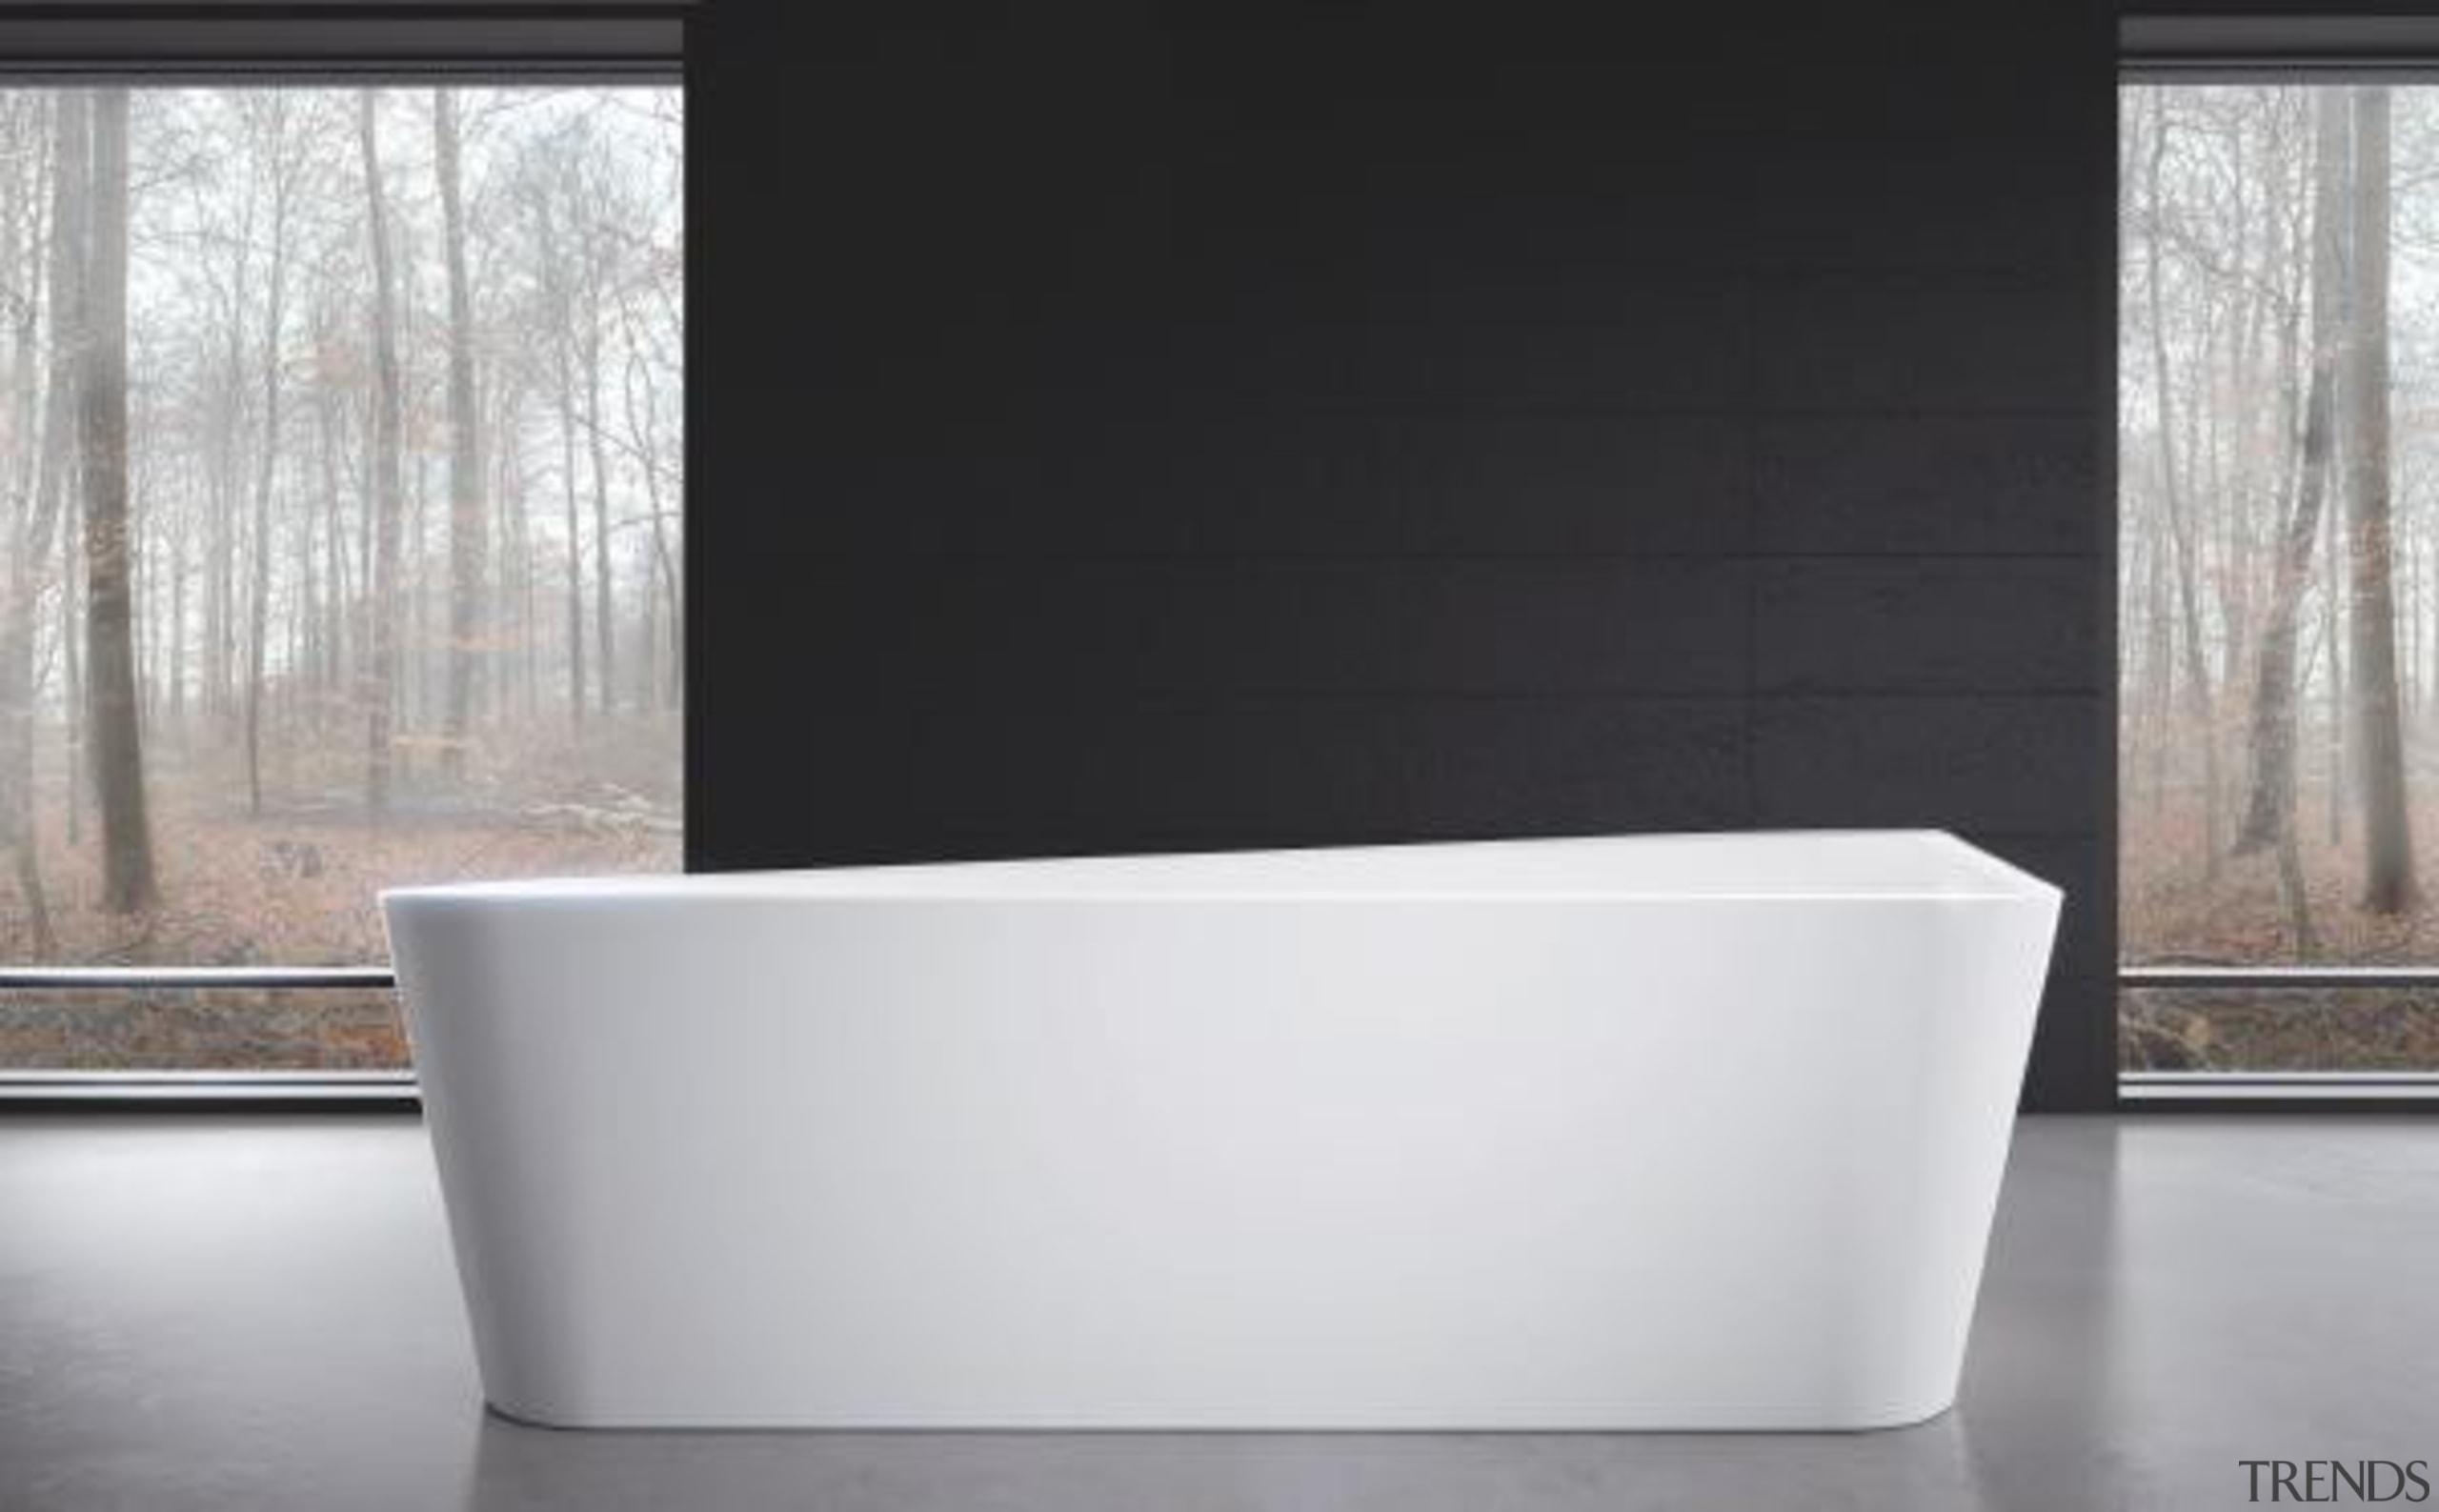 Working with star designer Arik Levy, Kaldewei has angle, bathroom sink, bathtub, plumbing fixture, product design, tap, black, white, gray